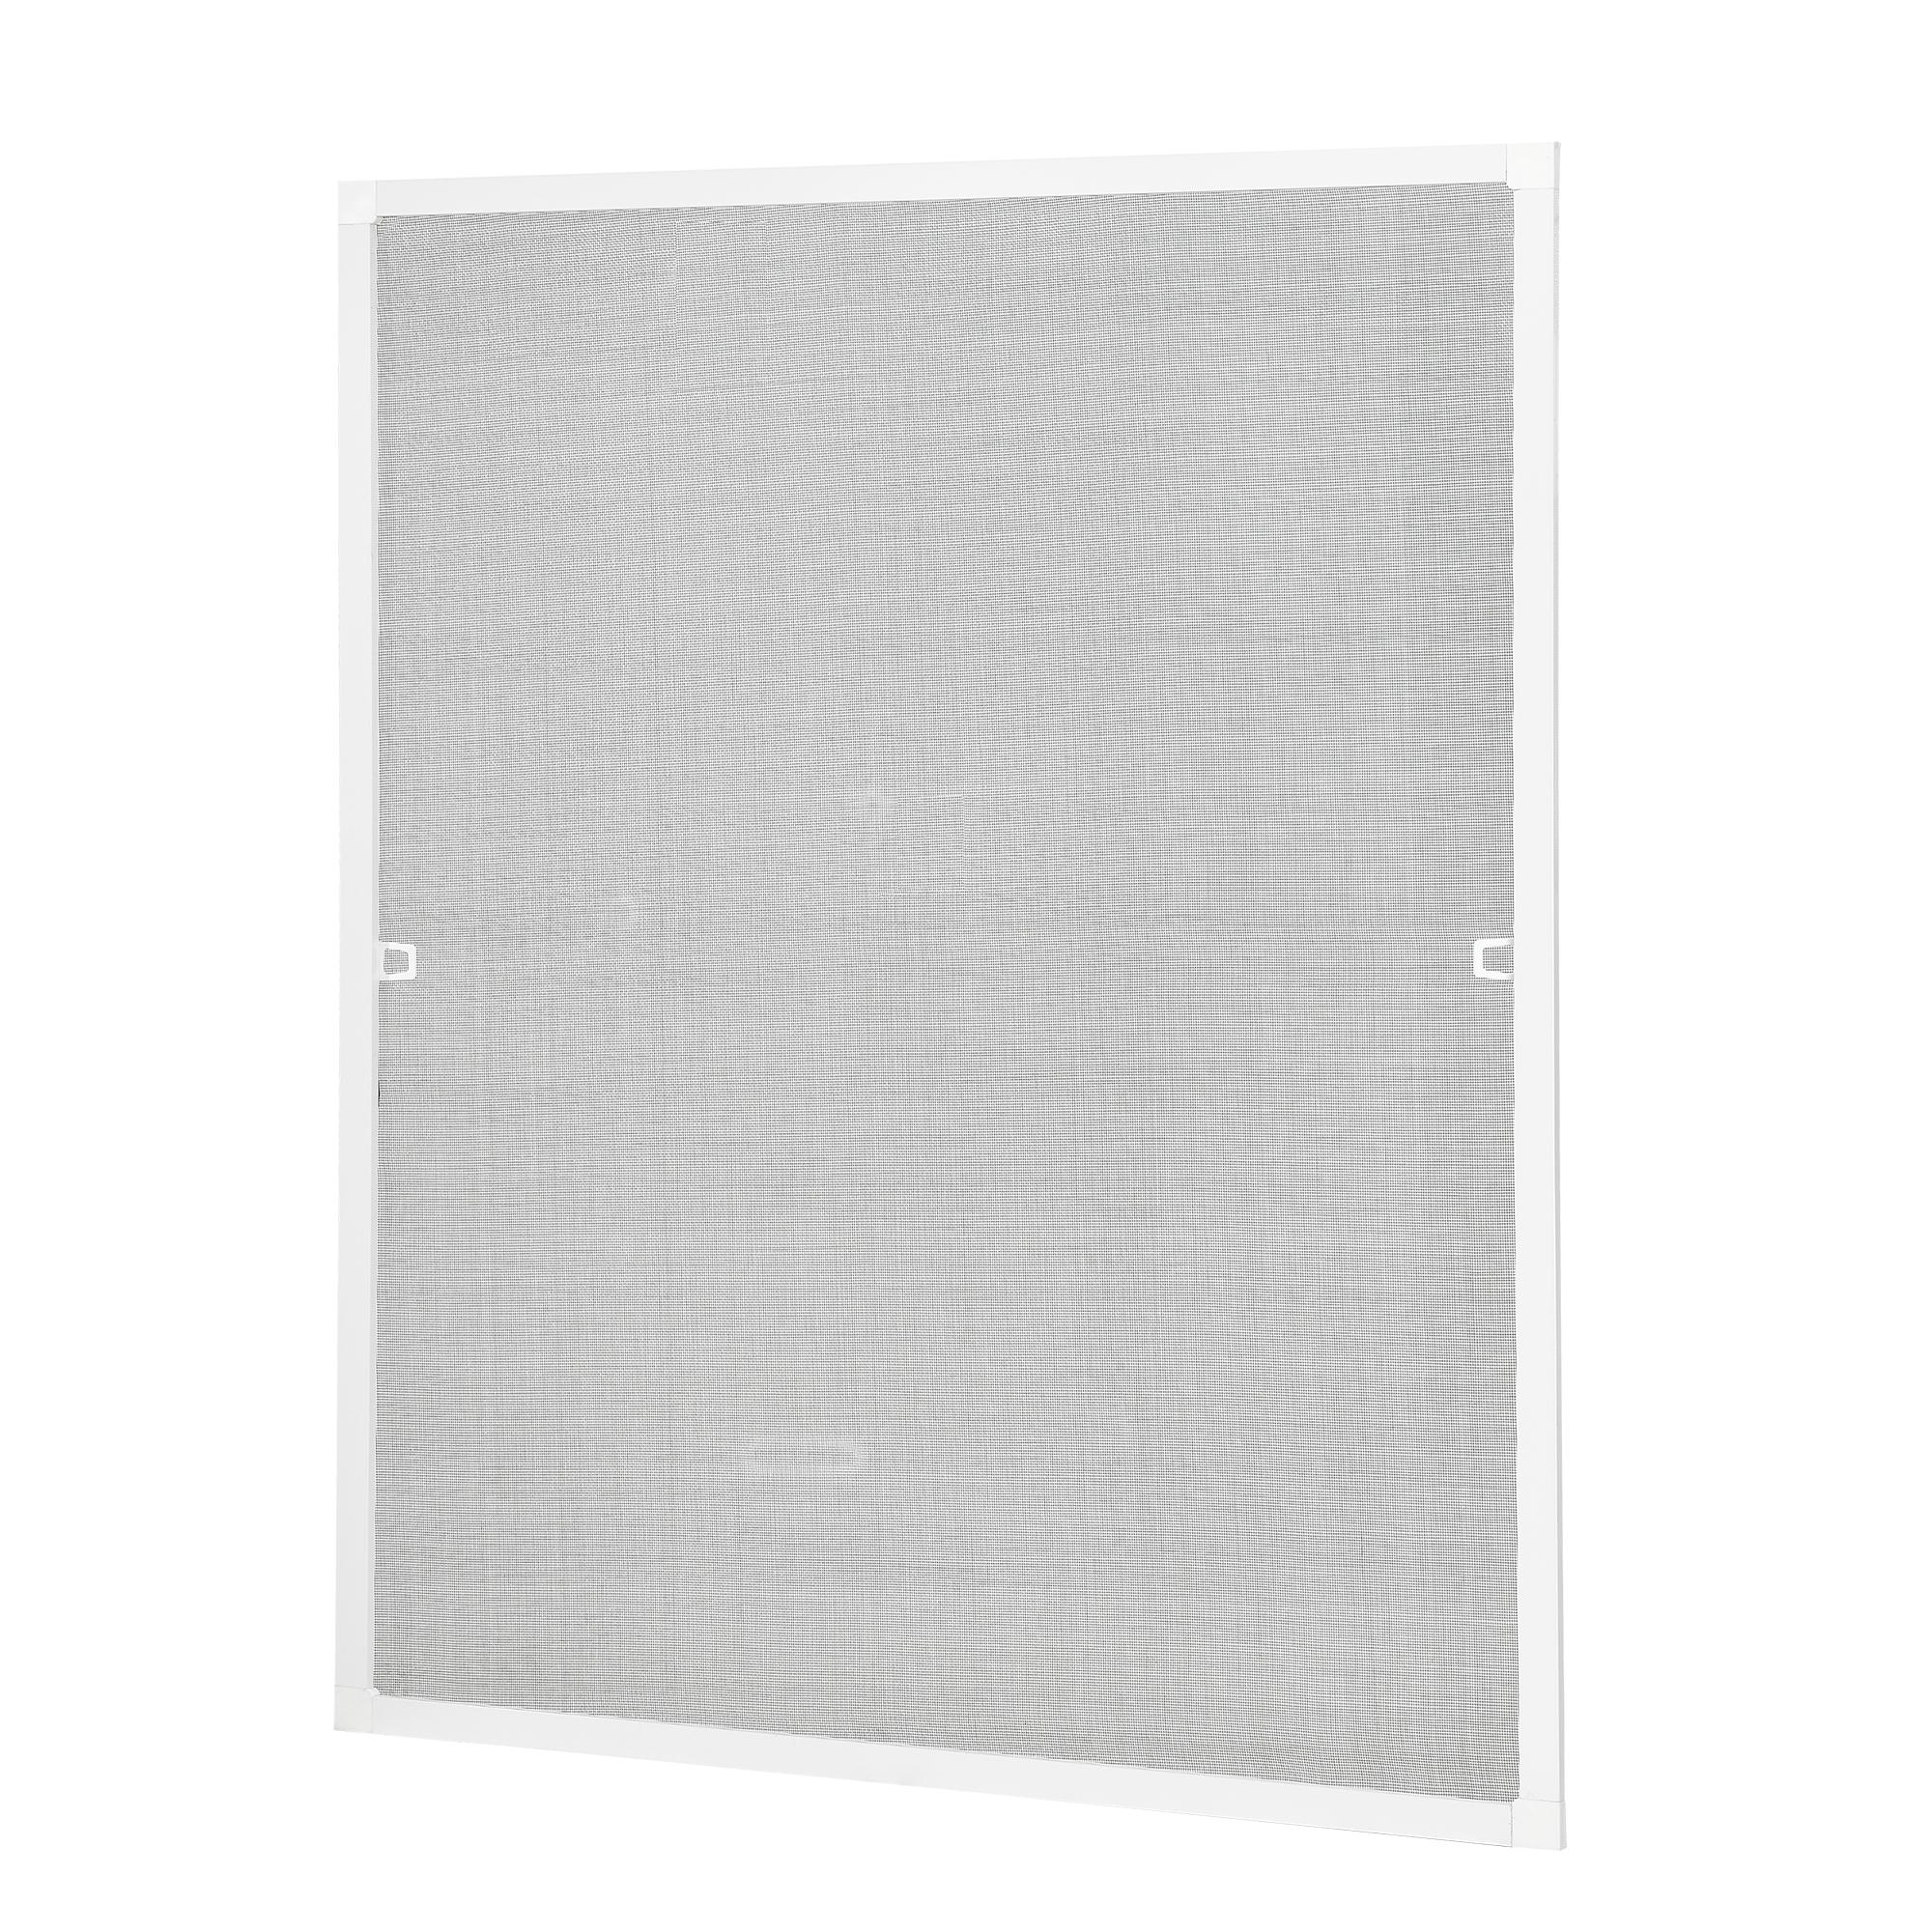 [casa.pro]® Síťka proti hmyzu 100 x 120 cm - hliníkový rám - bílý